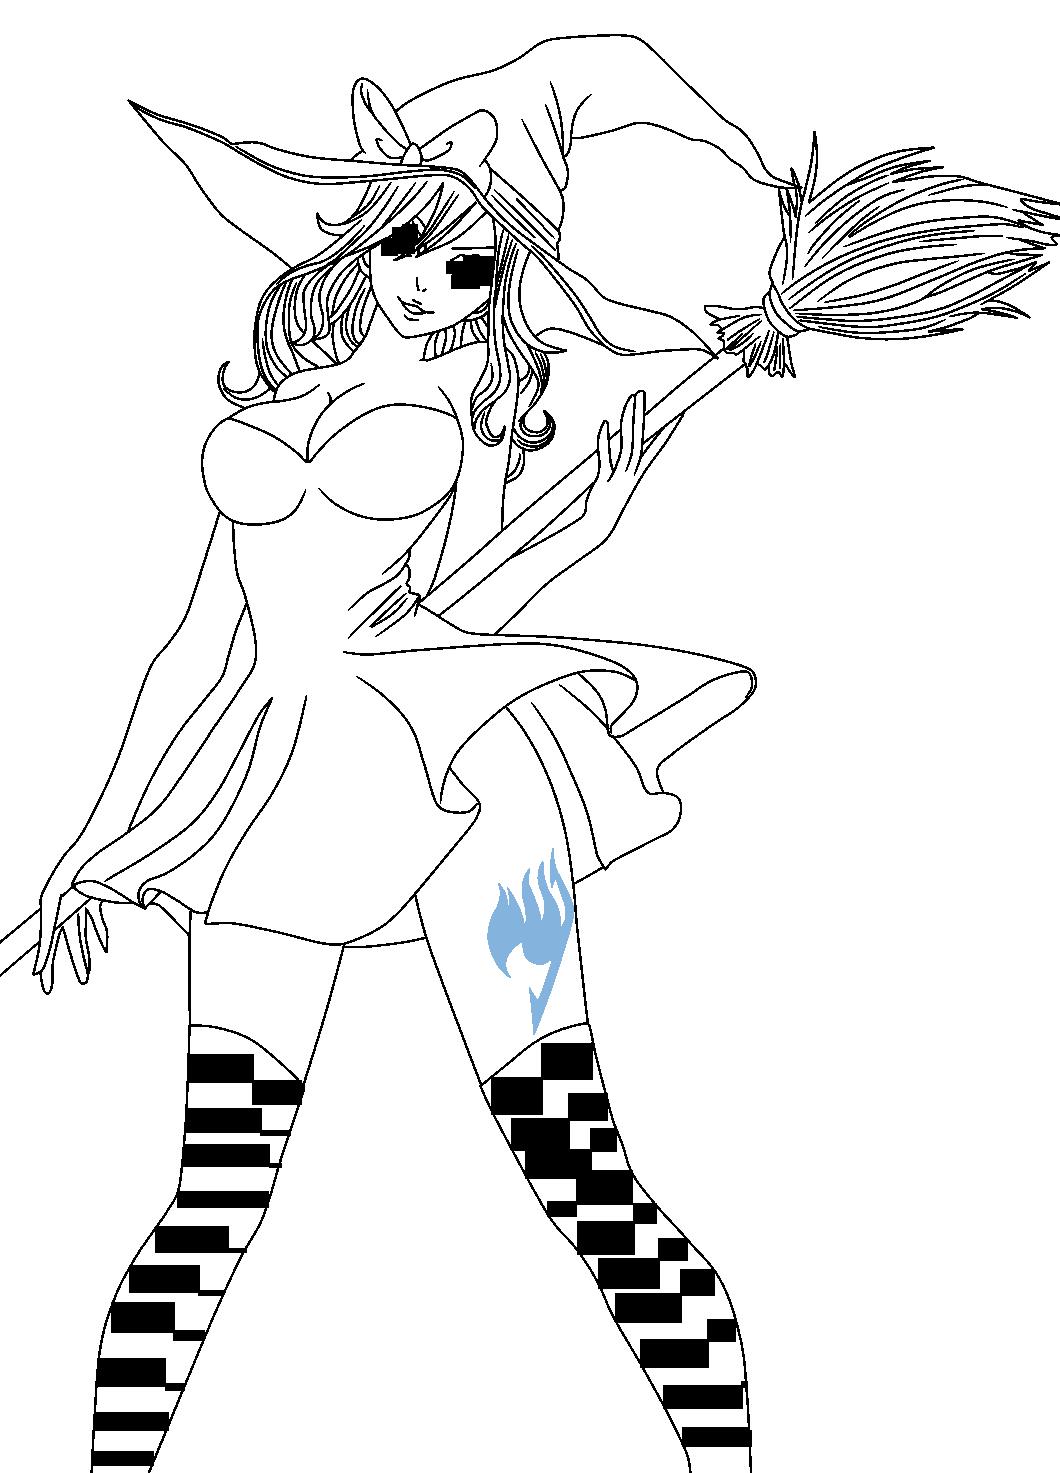 Juvia Lineart : Juvia loxar lineart by cursedicedragon on deviantart